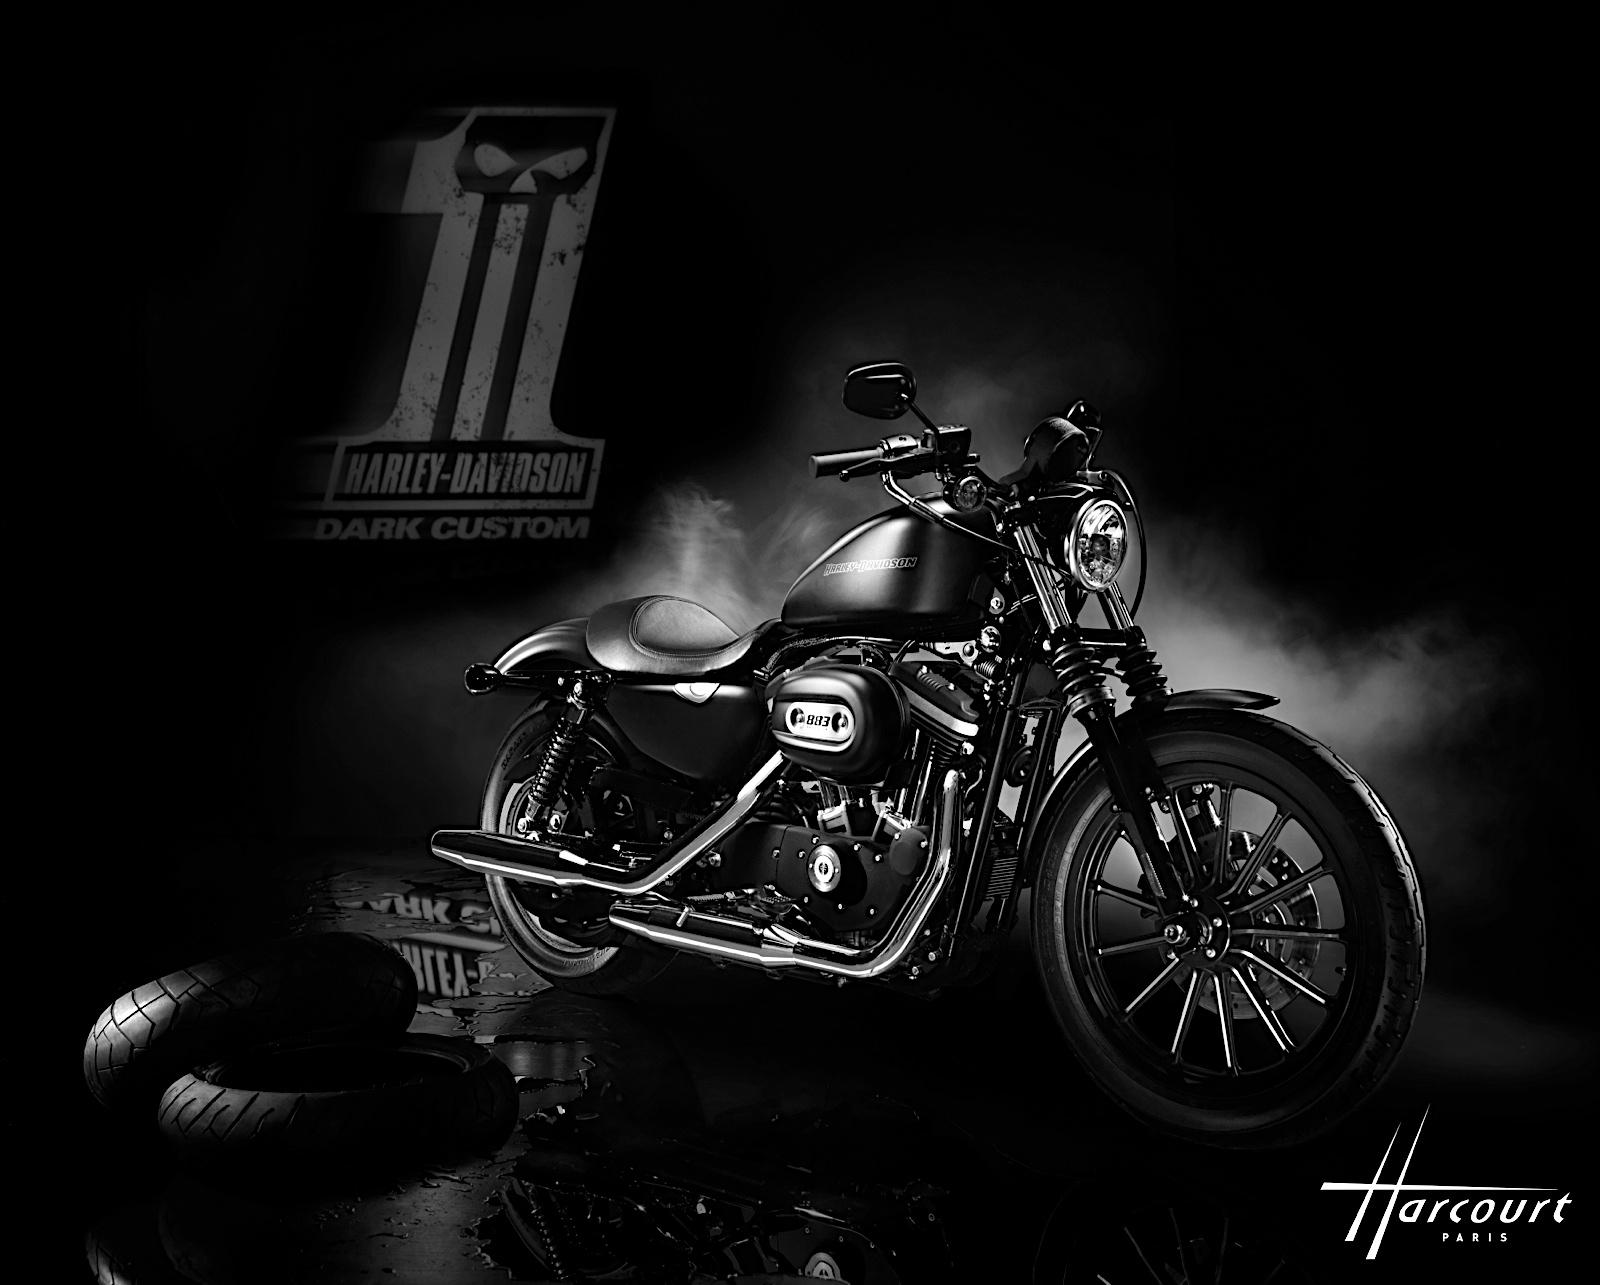 Harley Davidson Iron 883 Hd Wallpapers 1080p